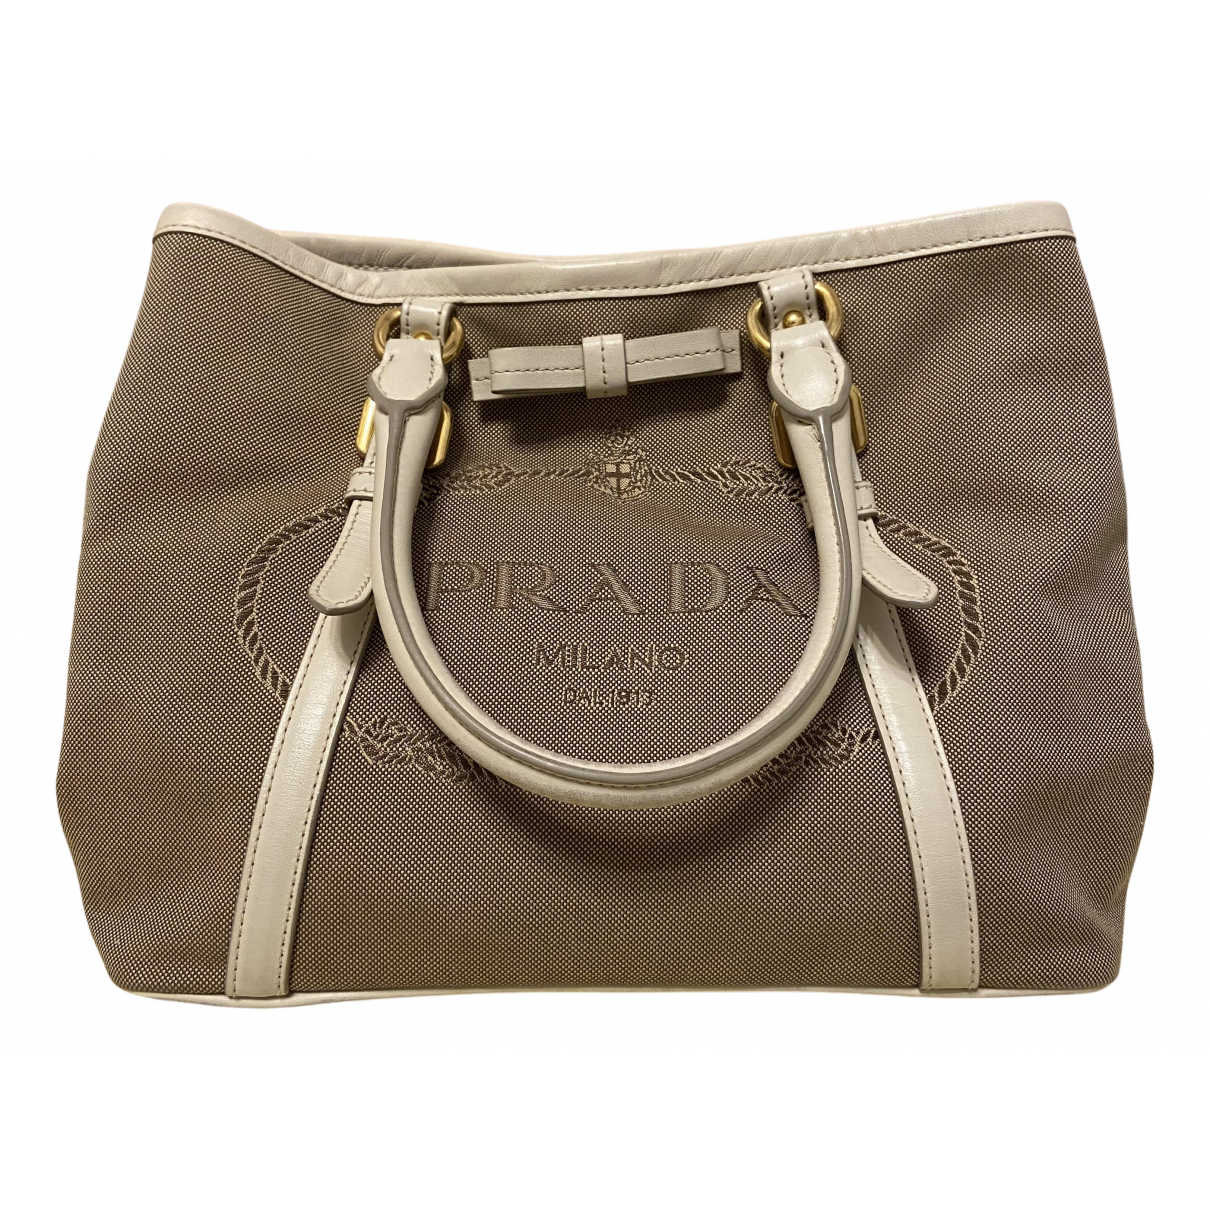 Prada \N Handtasche in  Khaki Baumwolle